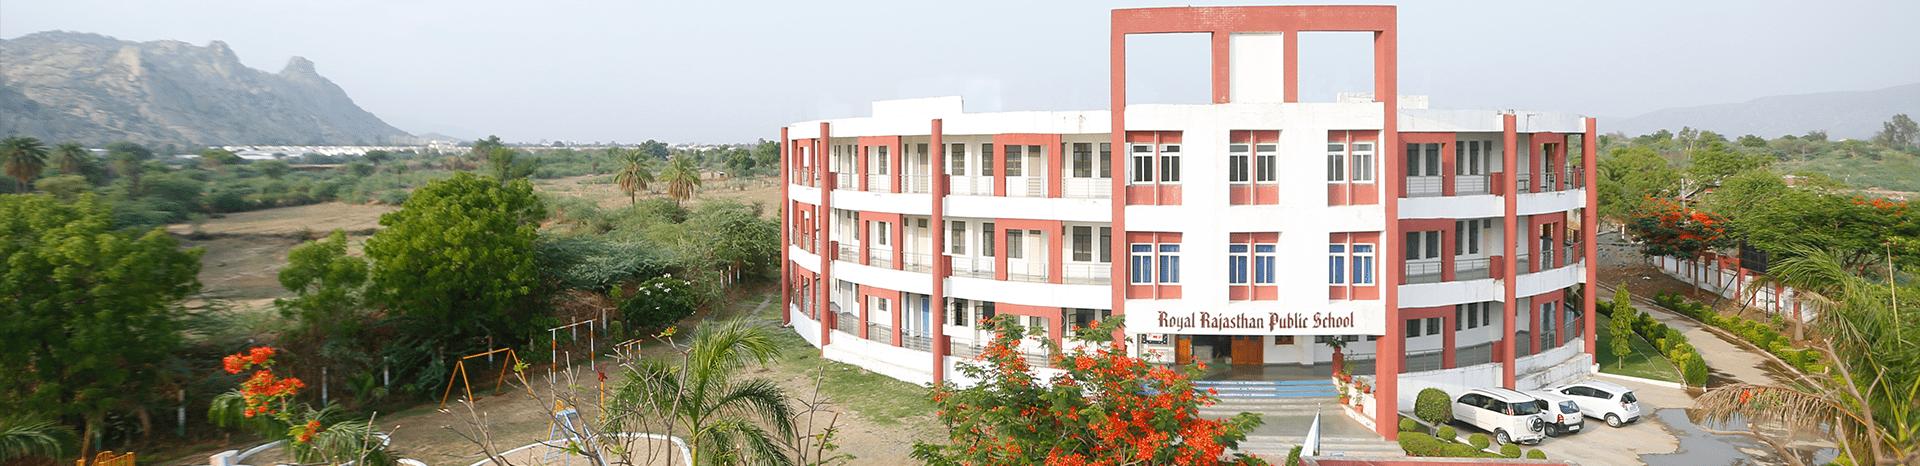 Royal Rajasthan Public School - Best Boarding School in India